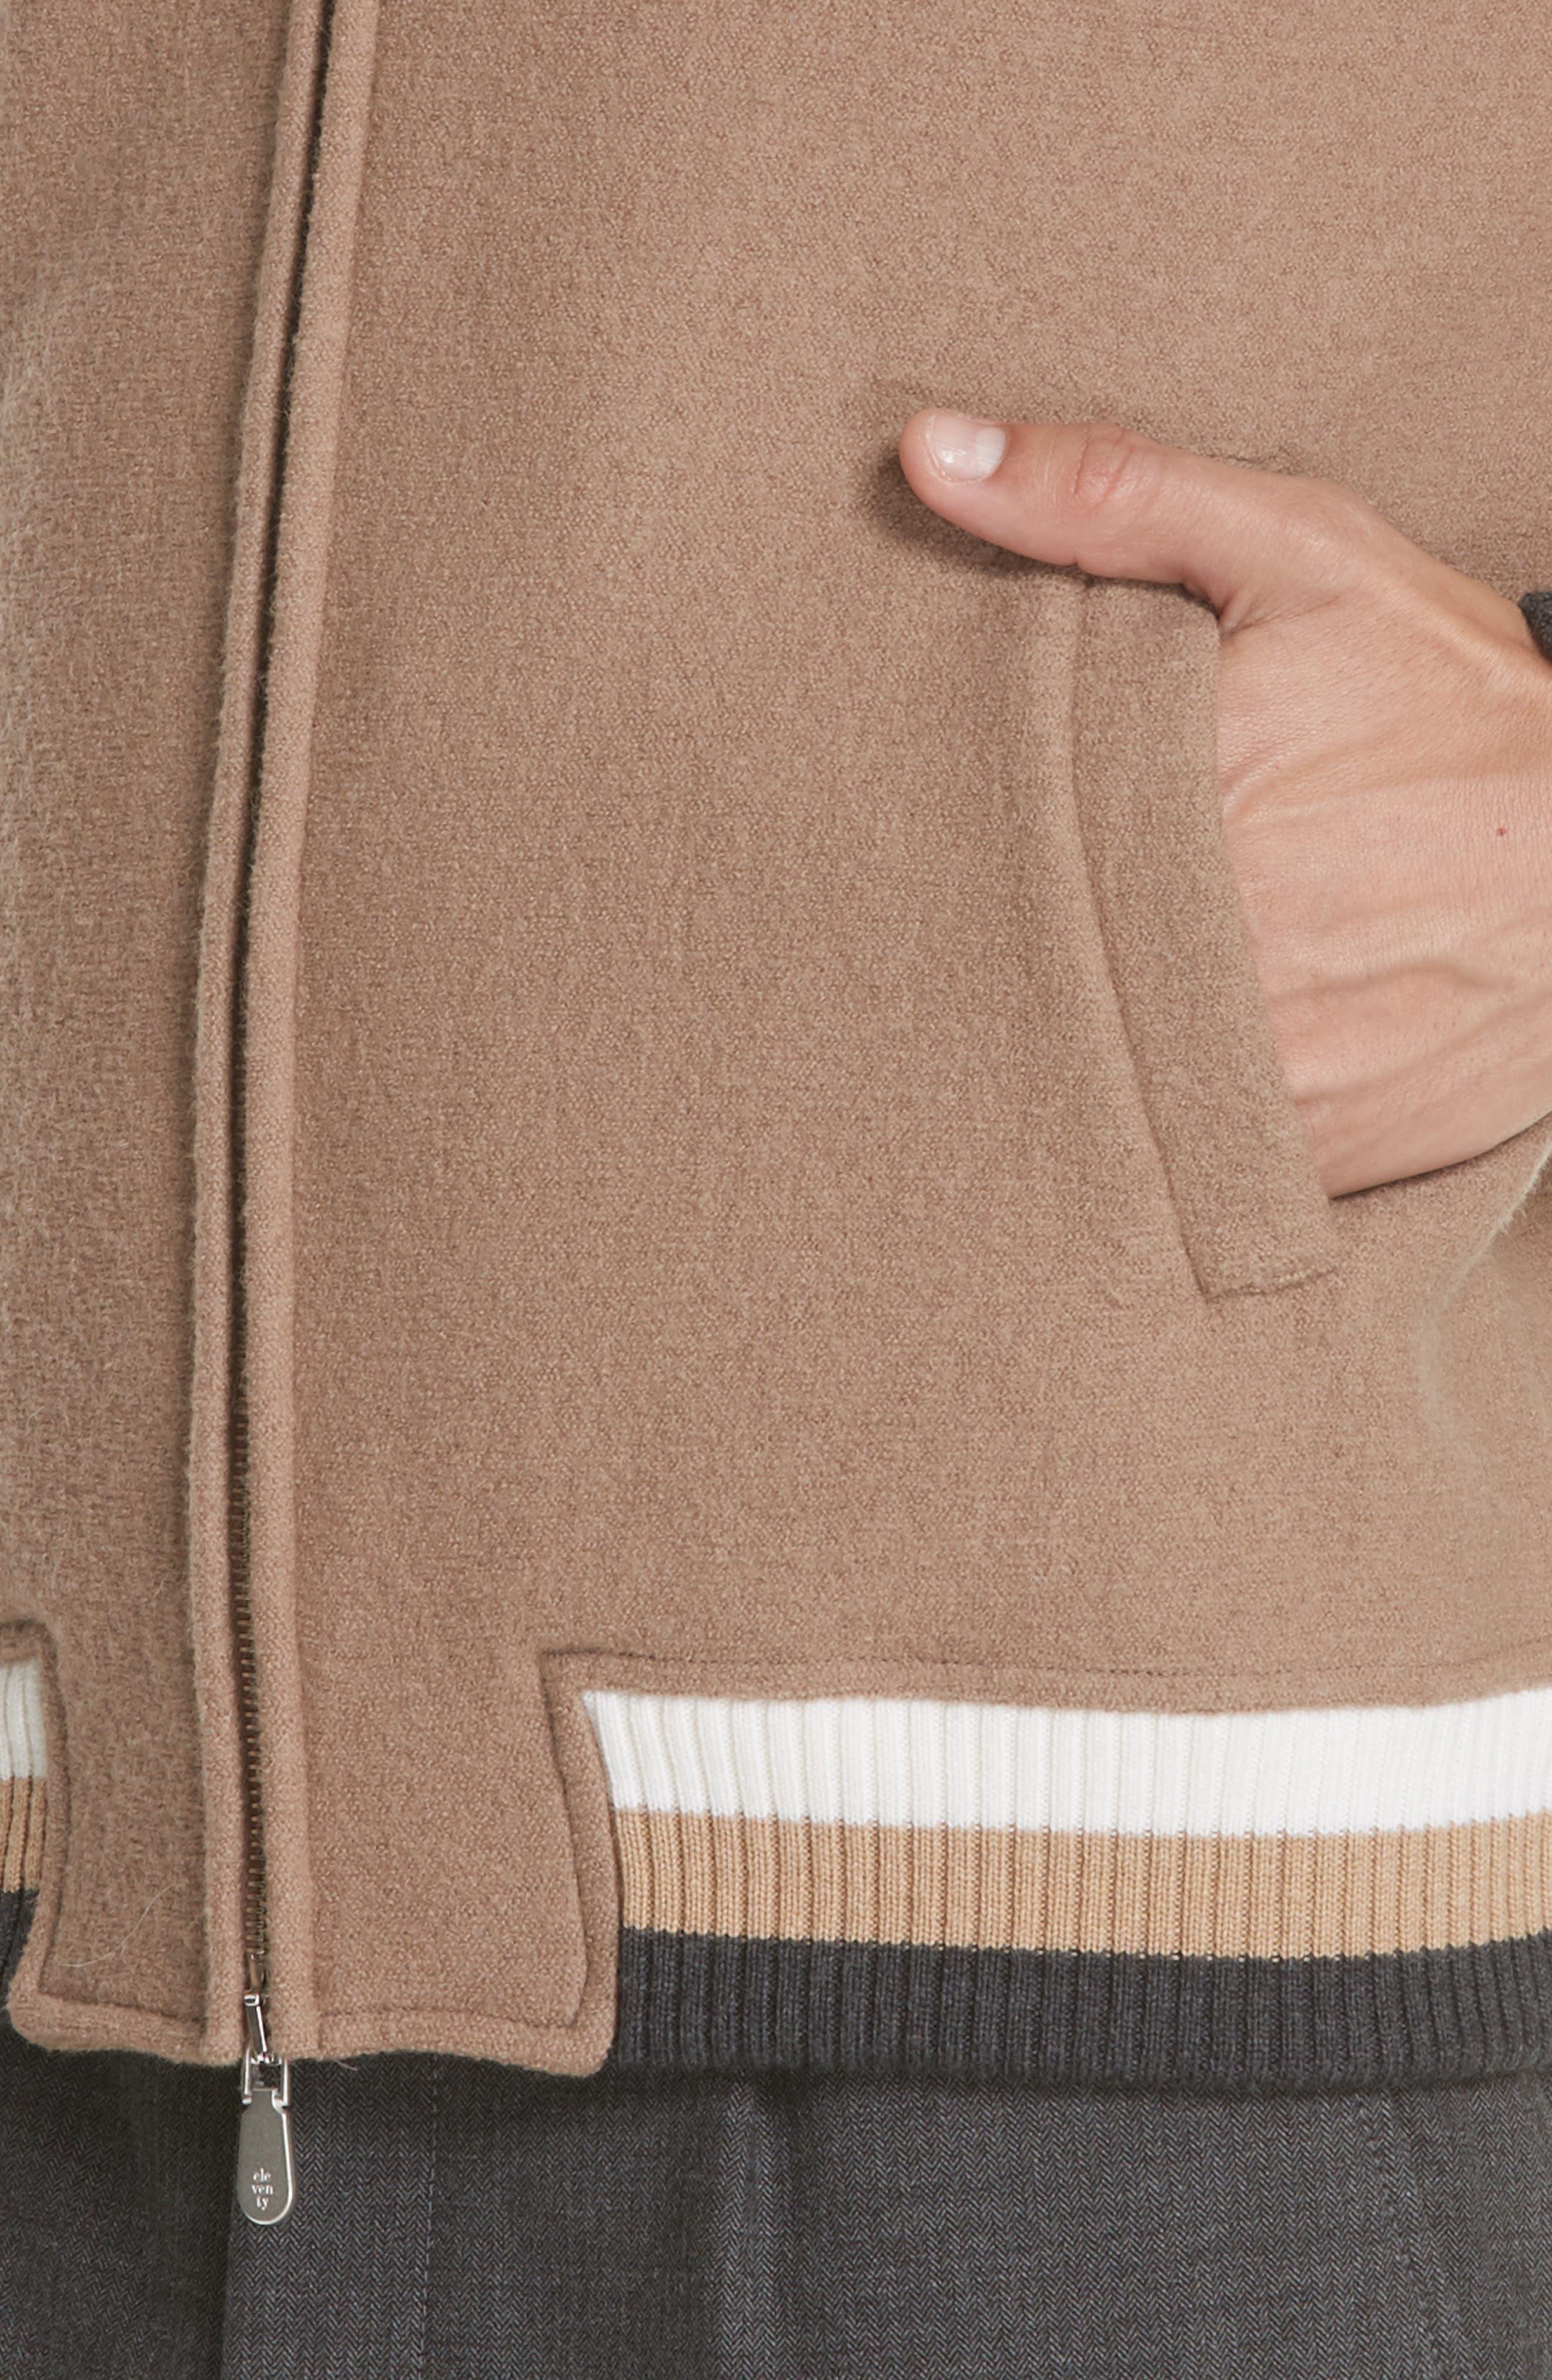 Wool Bomber Jacket,                             Alternate thumbnail 4, color,                             CAMEL